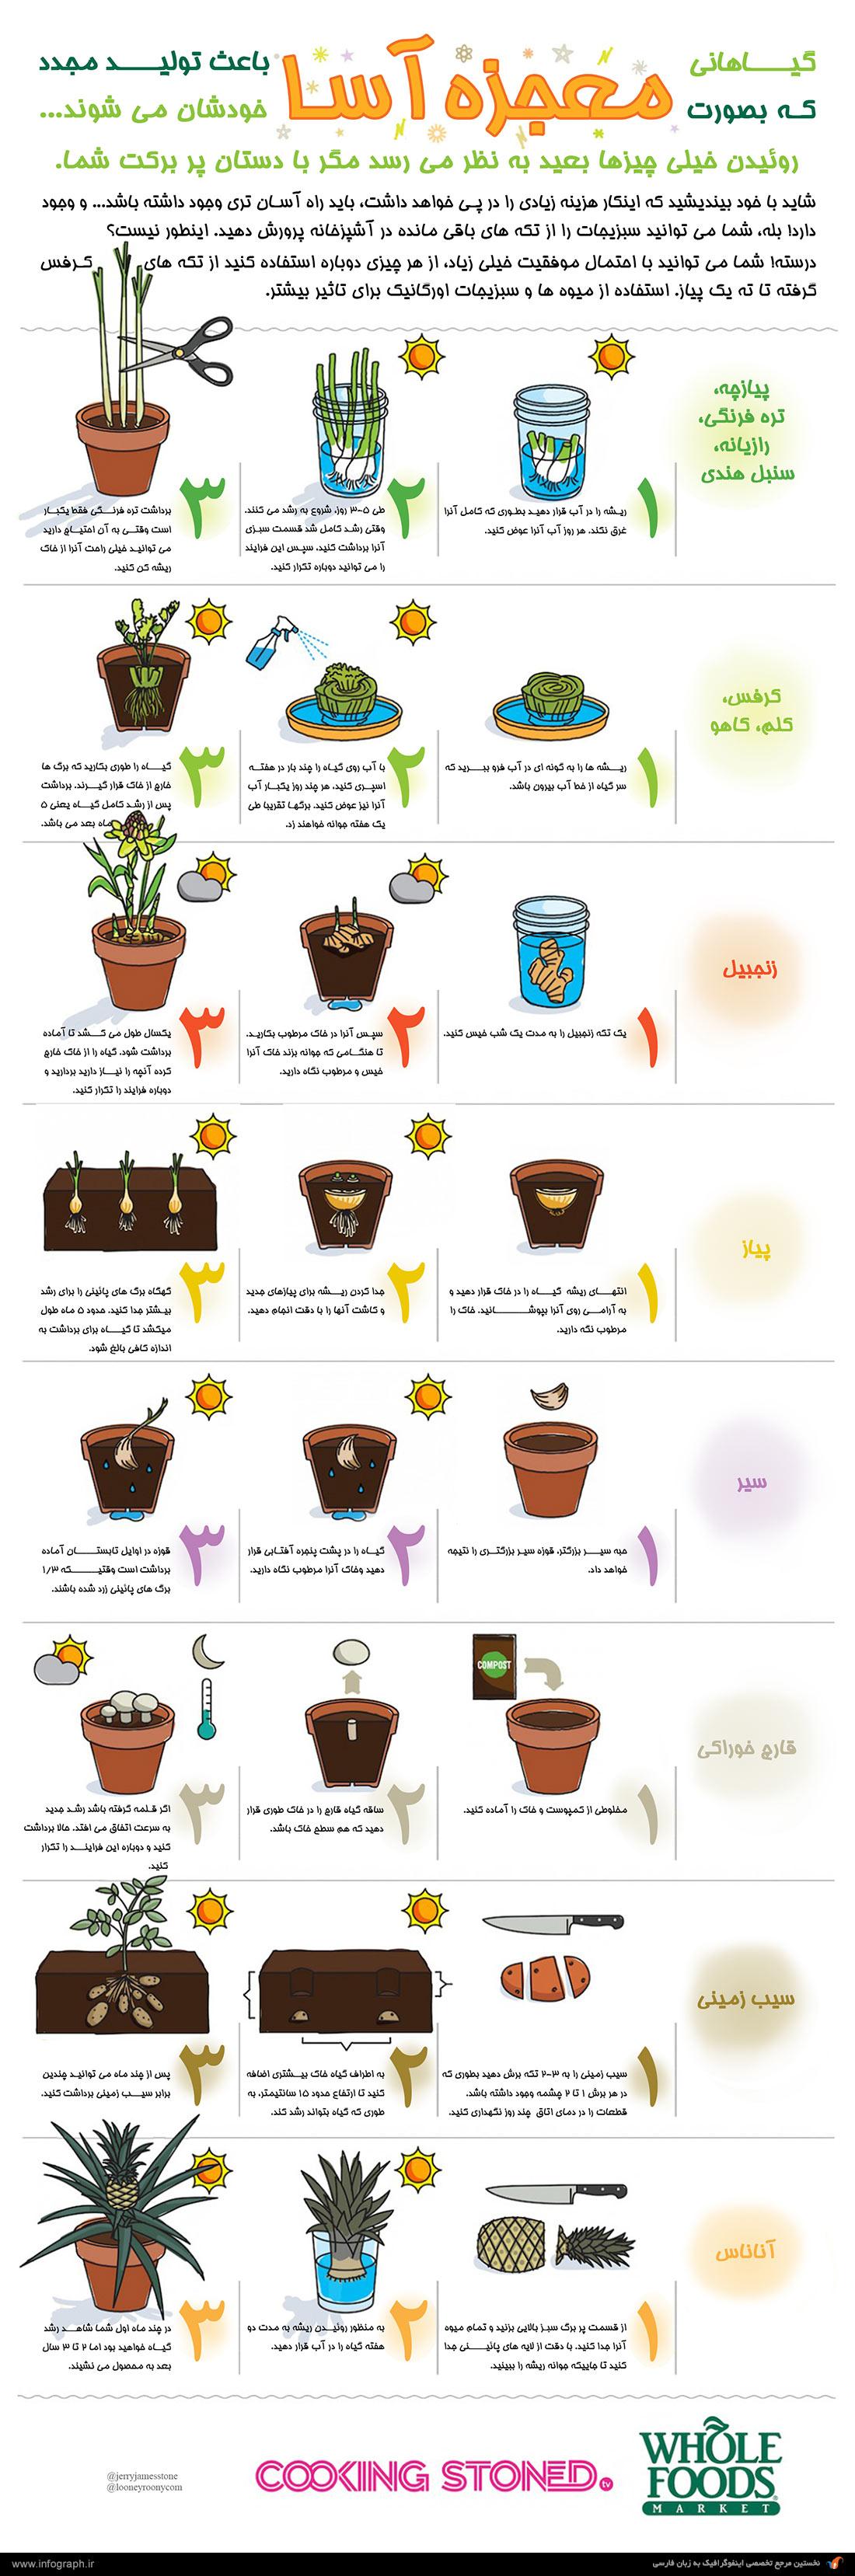 اینفوگرافیک گیاهان معجزه آسا